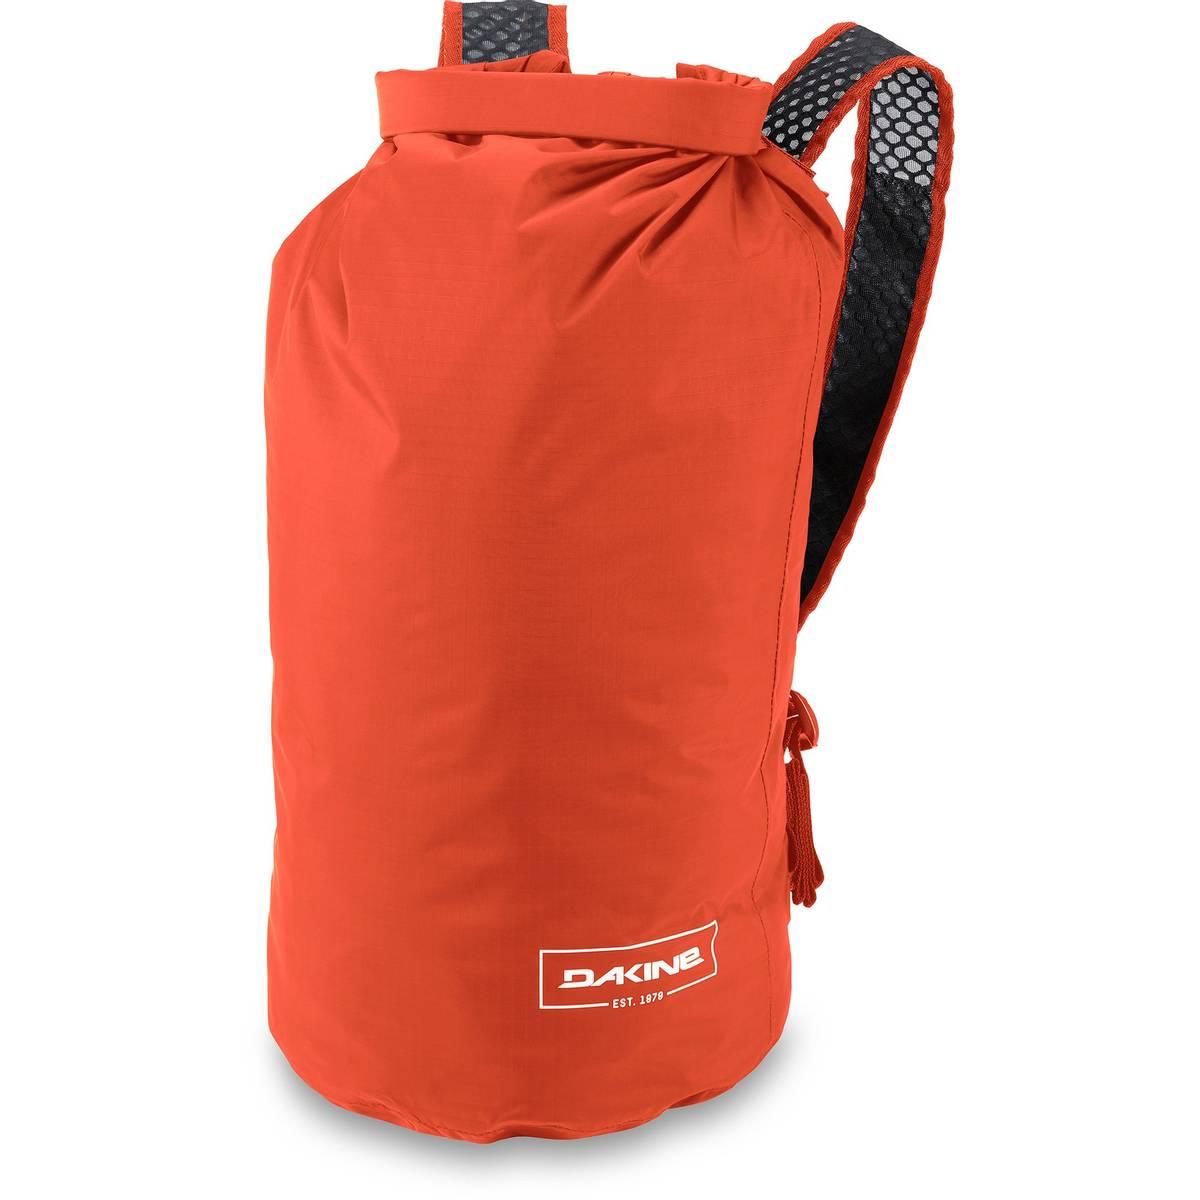 Dakine Packable Rolltop Dry Pack 30L Sun Flare